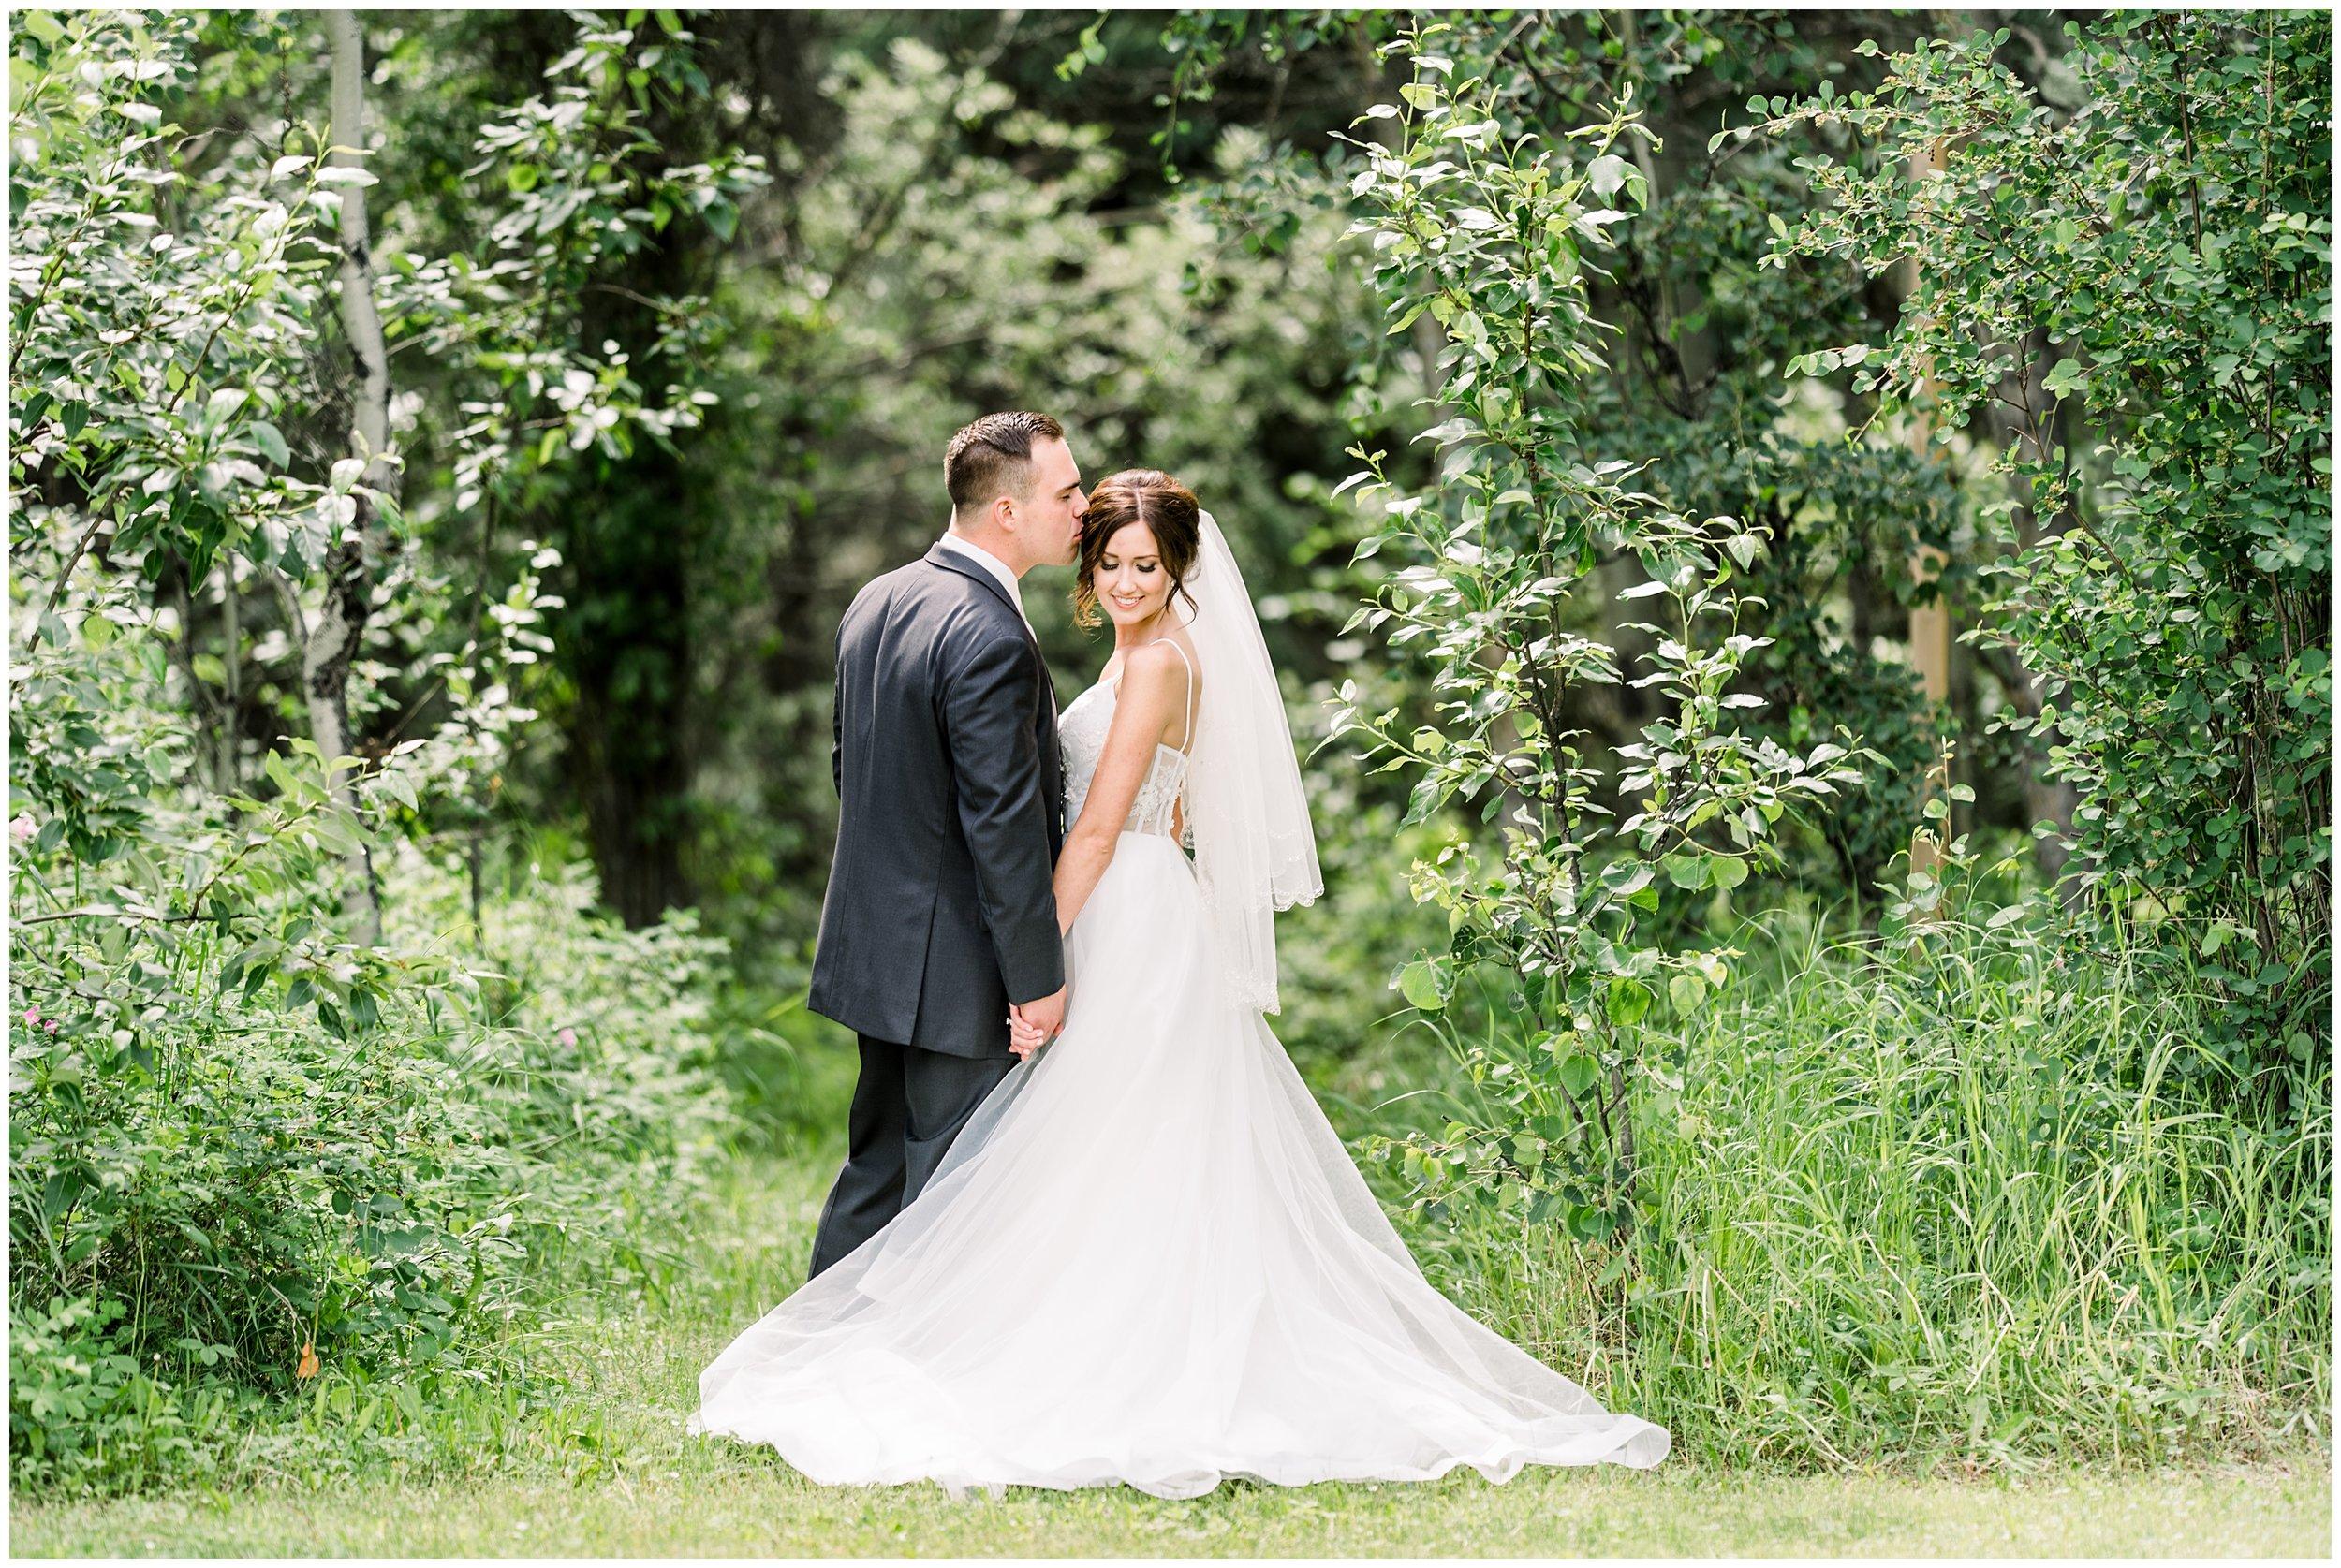 Alyssa-Poland-Photography_0614_alberta wedding.jpg